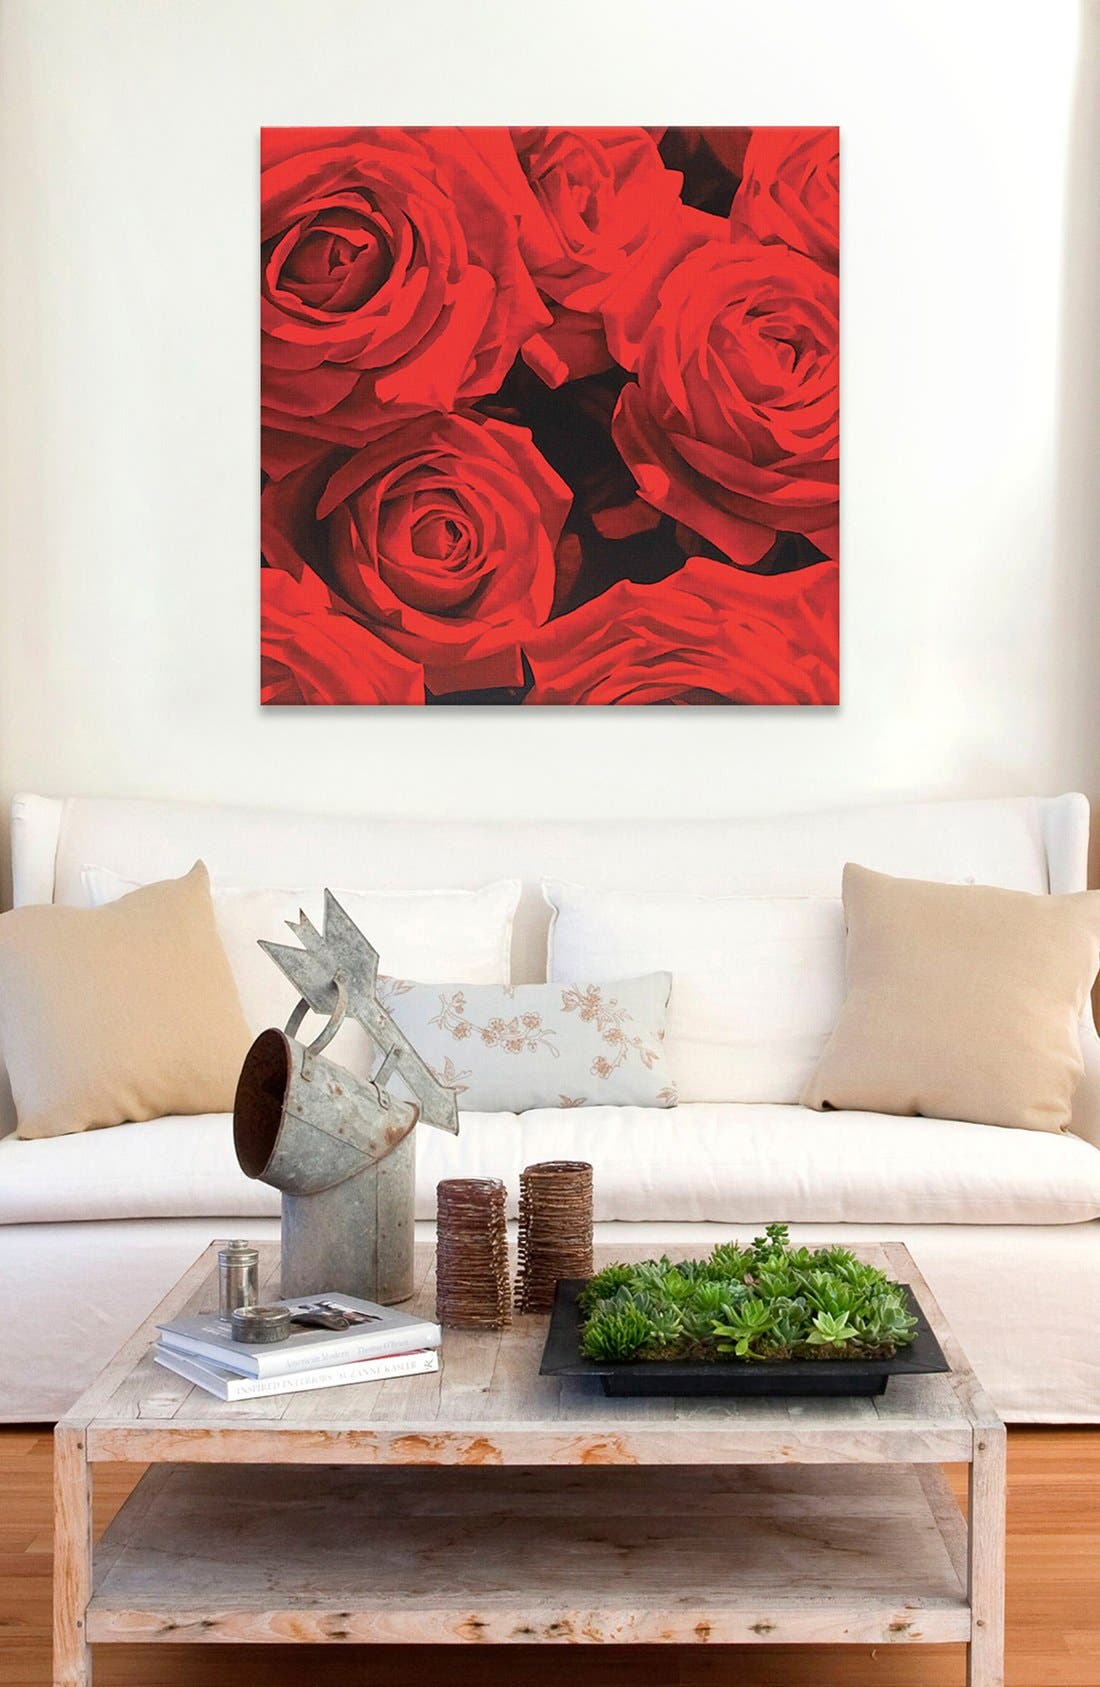 'Red Roses' Giclée Print Canvas Art,                             Alternate thumbnail 2, color,                             600